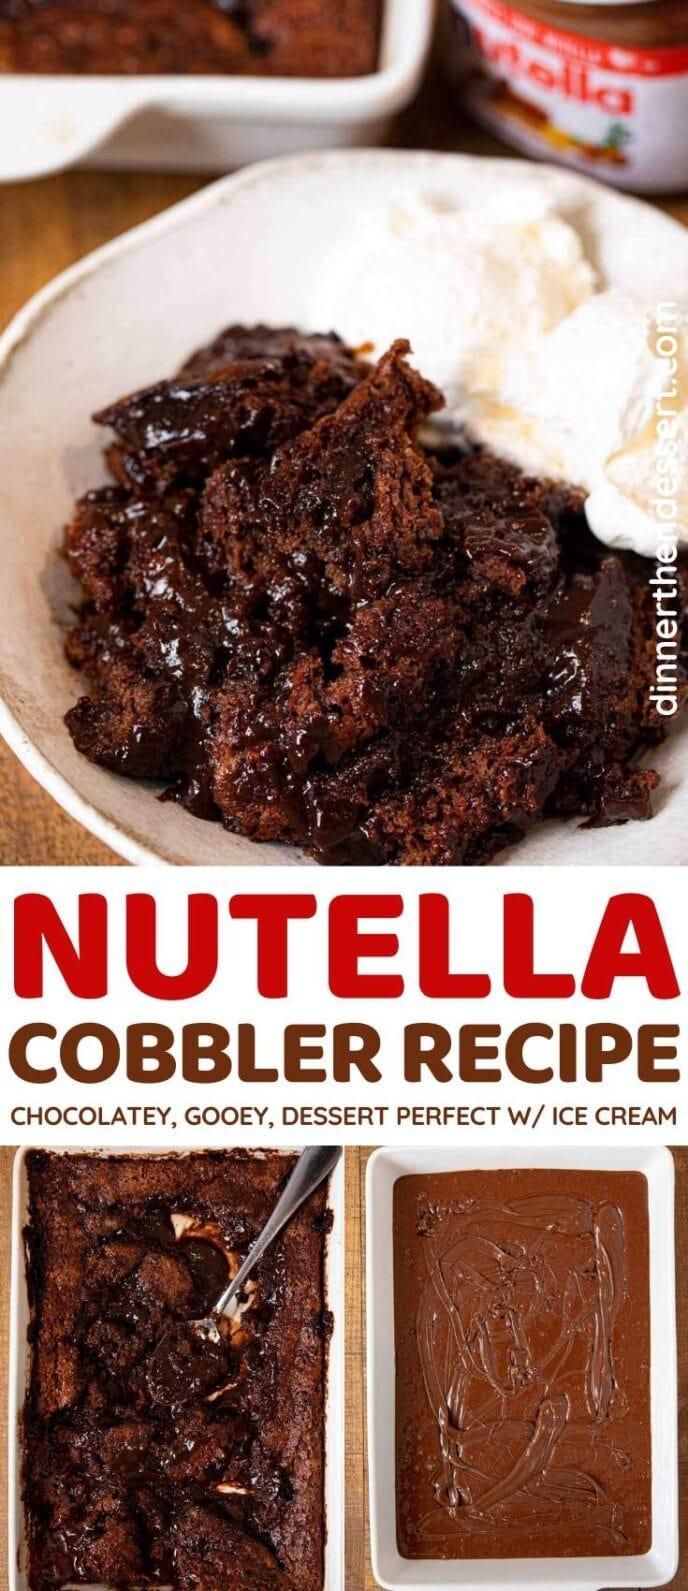 Nutella Cobbler collage